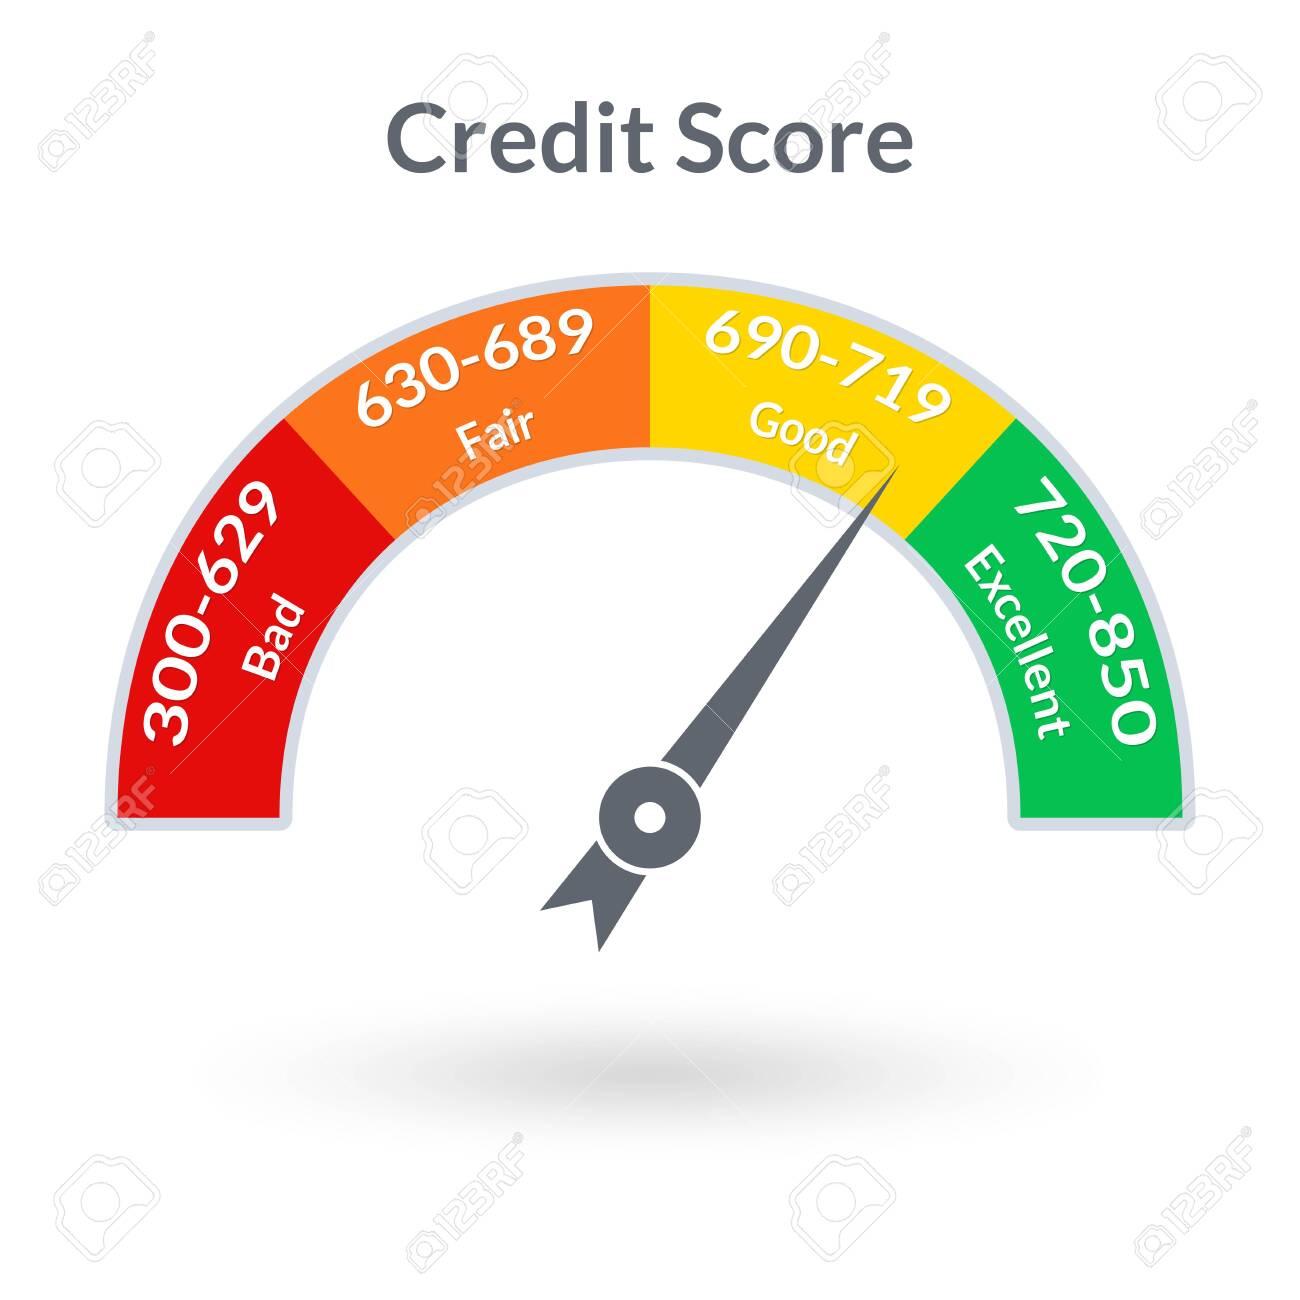 Credit score gauge. Good and Bad meter. Credit rating history report. Vector illustration. - 152775622